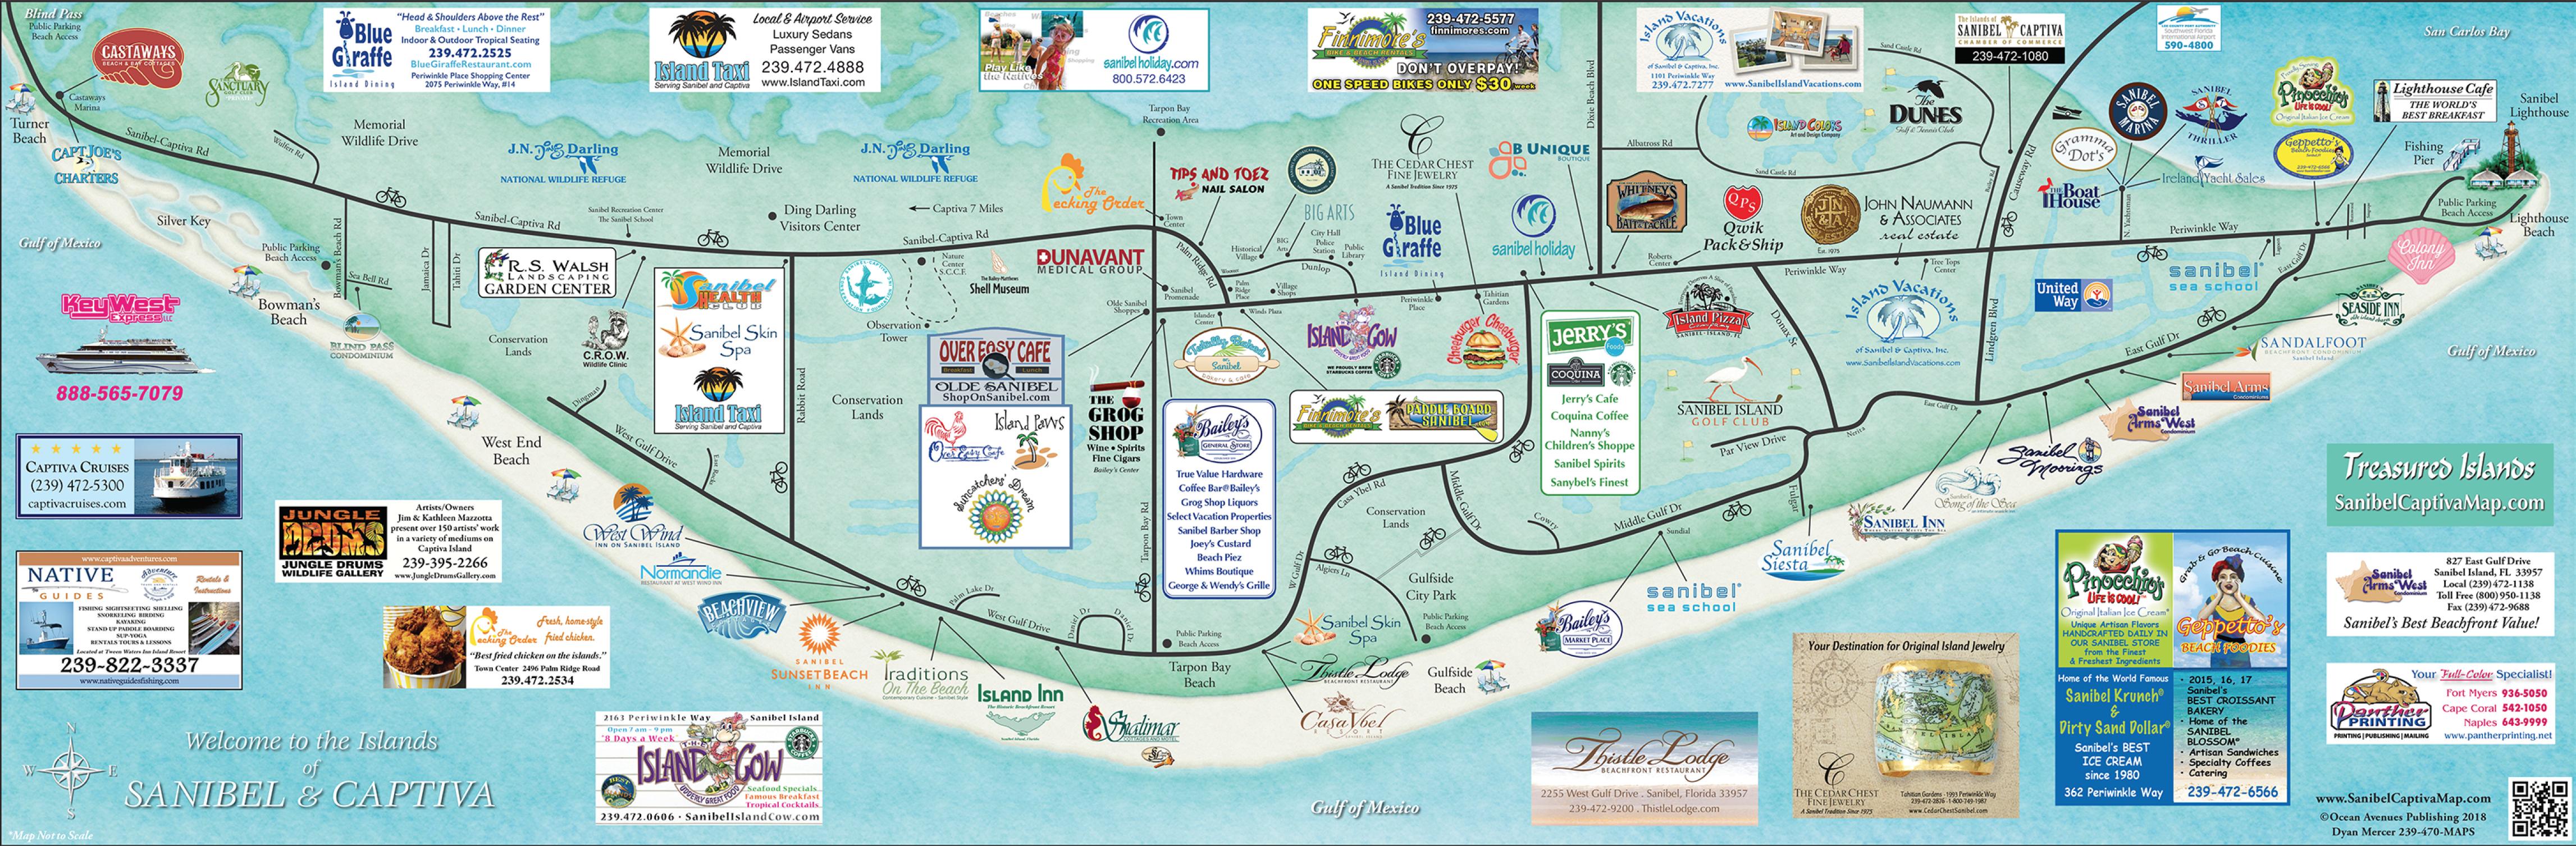 Map Sanibel Island Sanibel Island Map | Guest Information | Island Inn